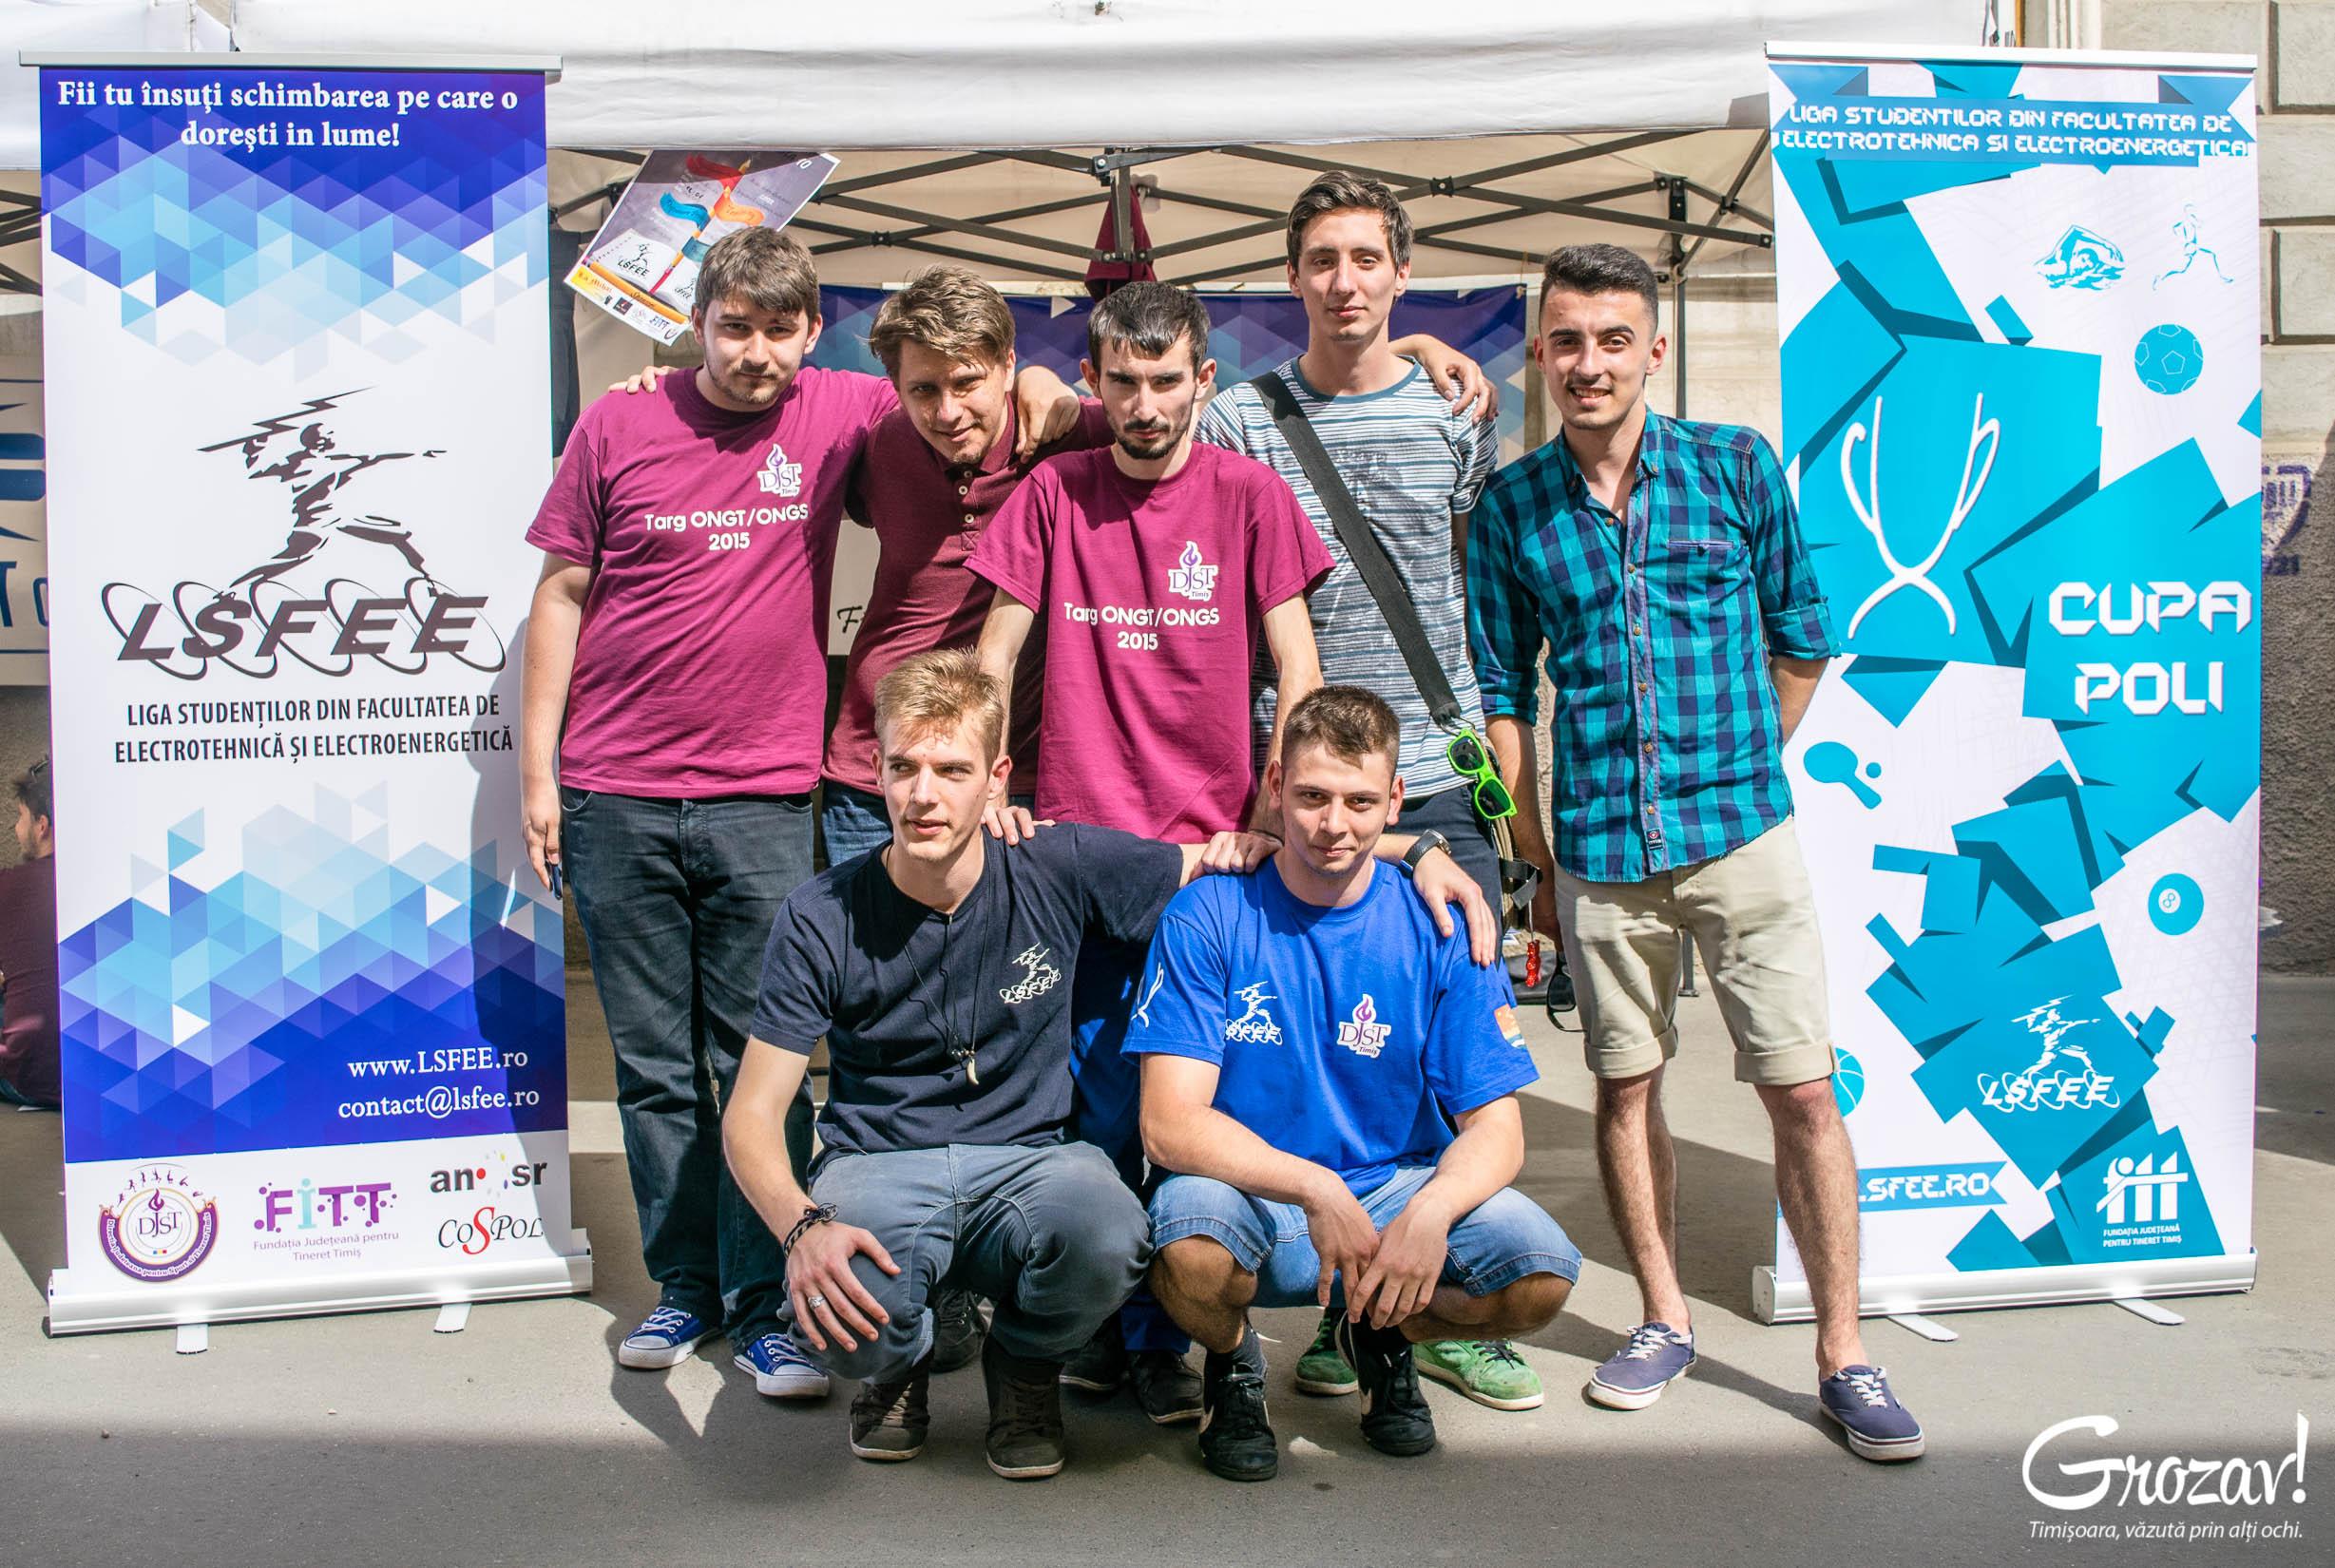 LSFEE Timisoara Targul ONG-urilor grozav